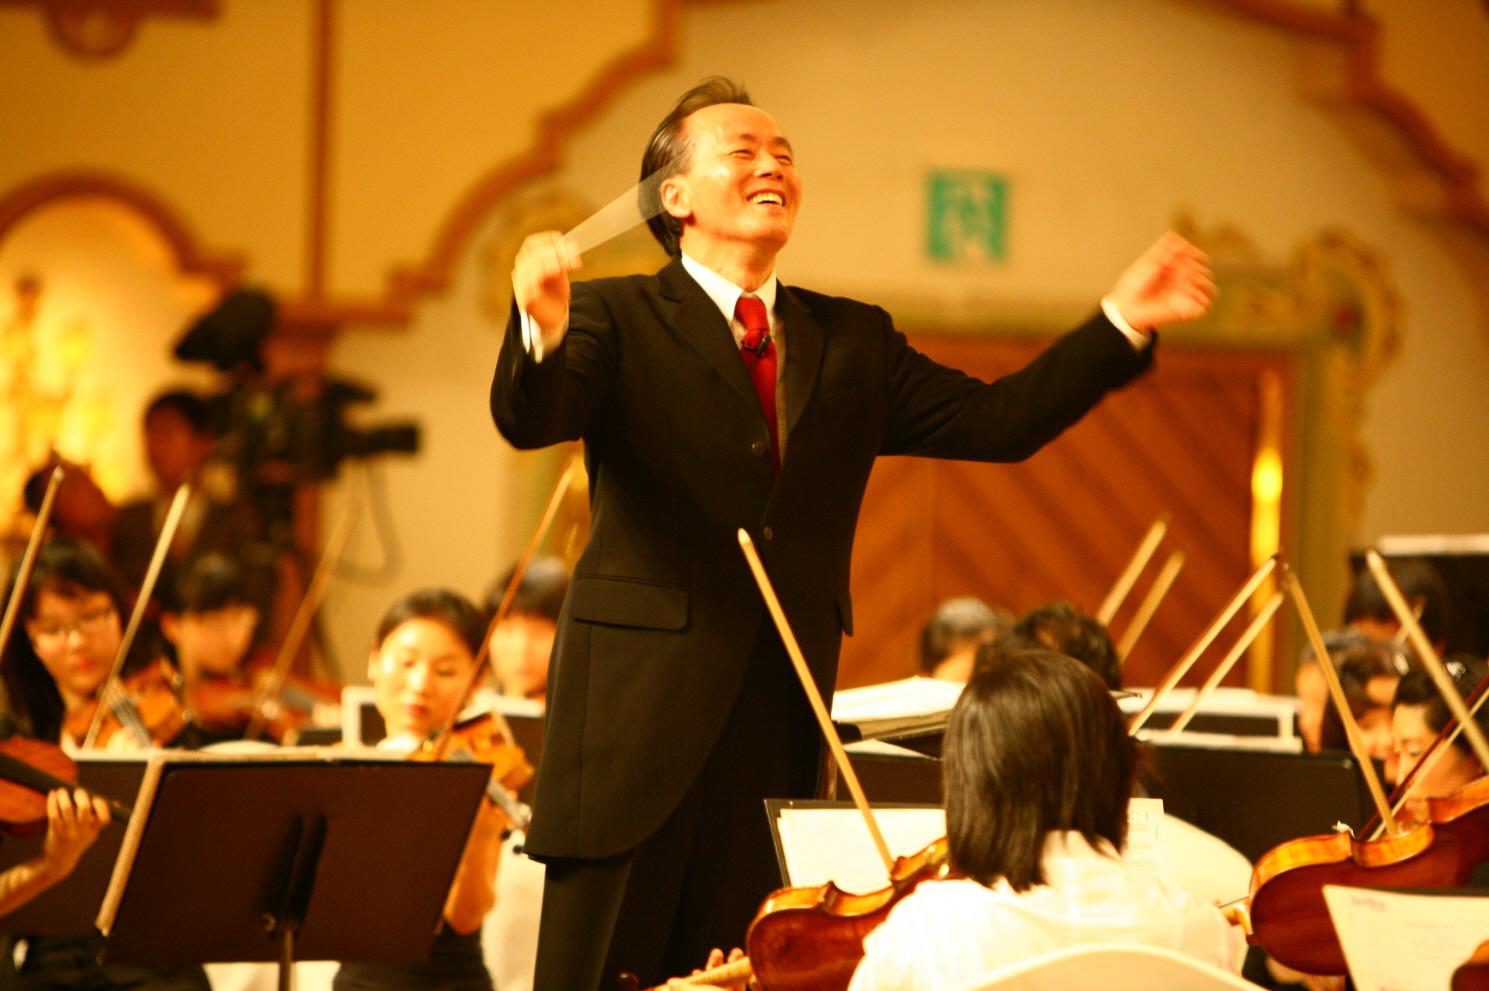 main image 【済州新羅ホテル】韓国の著名指揮者 クム・ナンセが解説する室内楽の音楽祭「